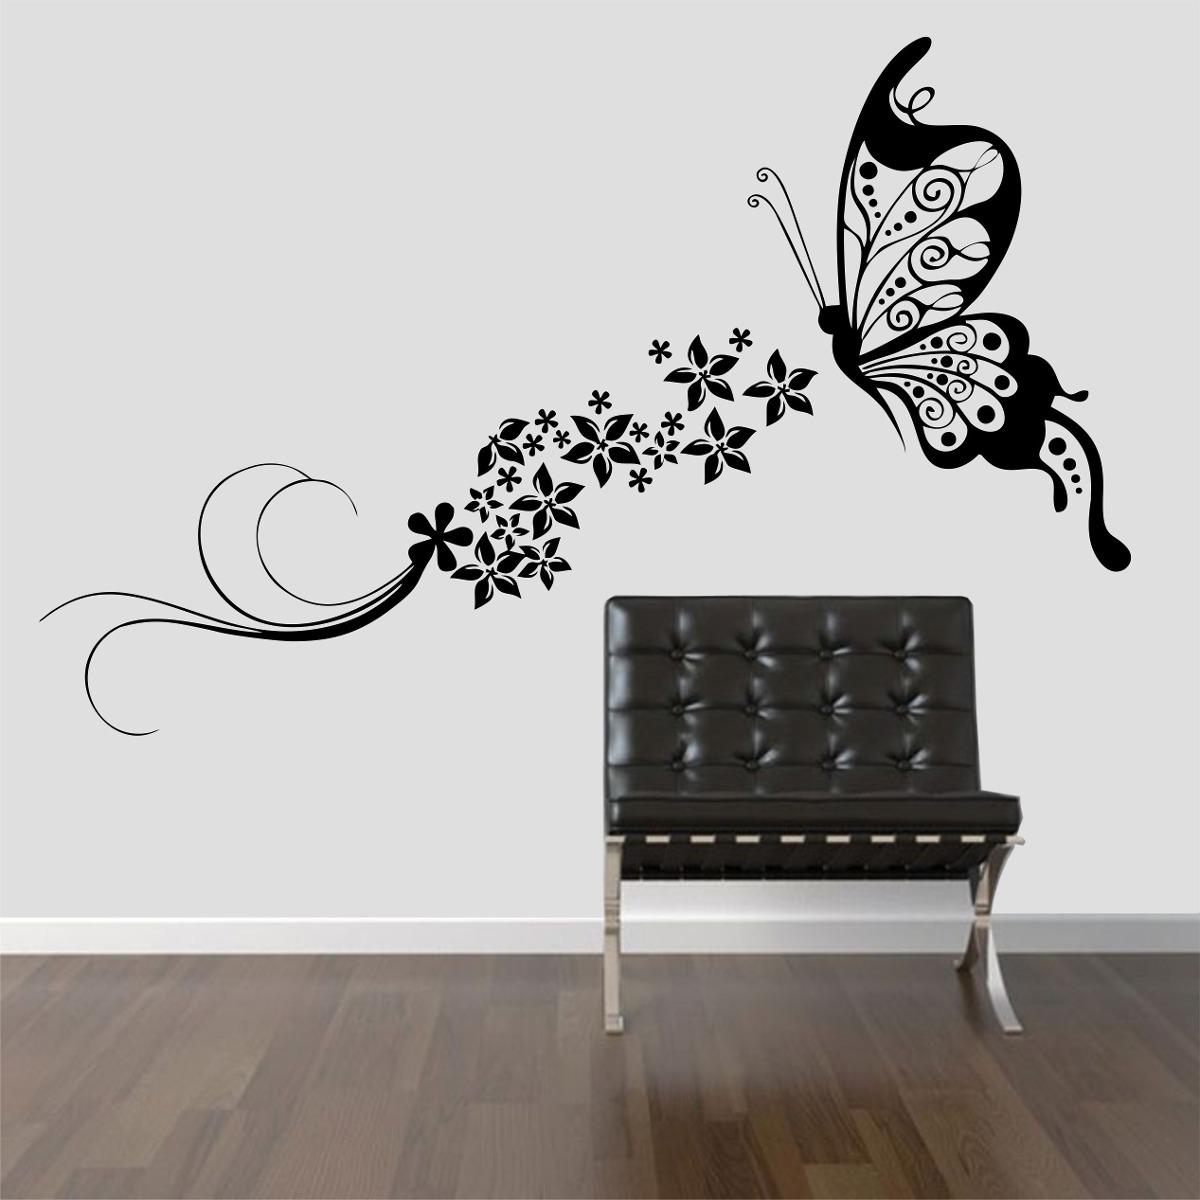 Armario Para Consultorio Odontologico Com Pia ~ Adesivo Decorativo Parede Borboleta Floral Flores Faixa